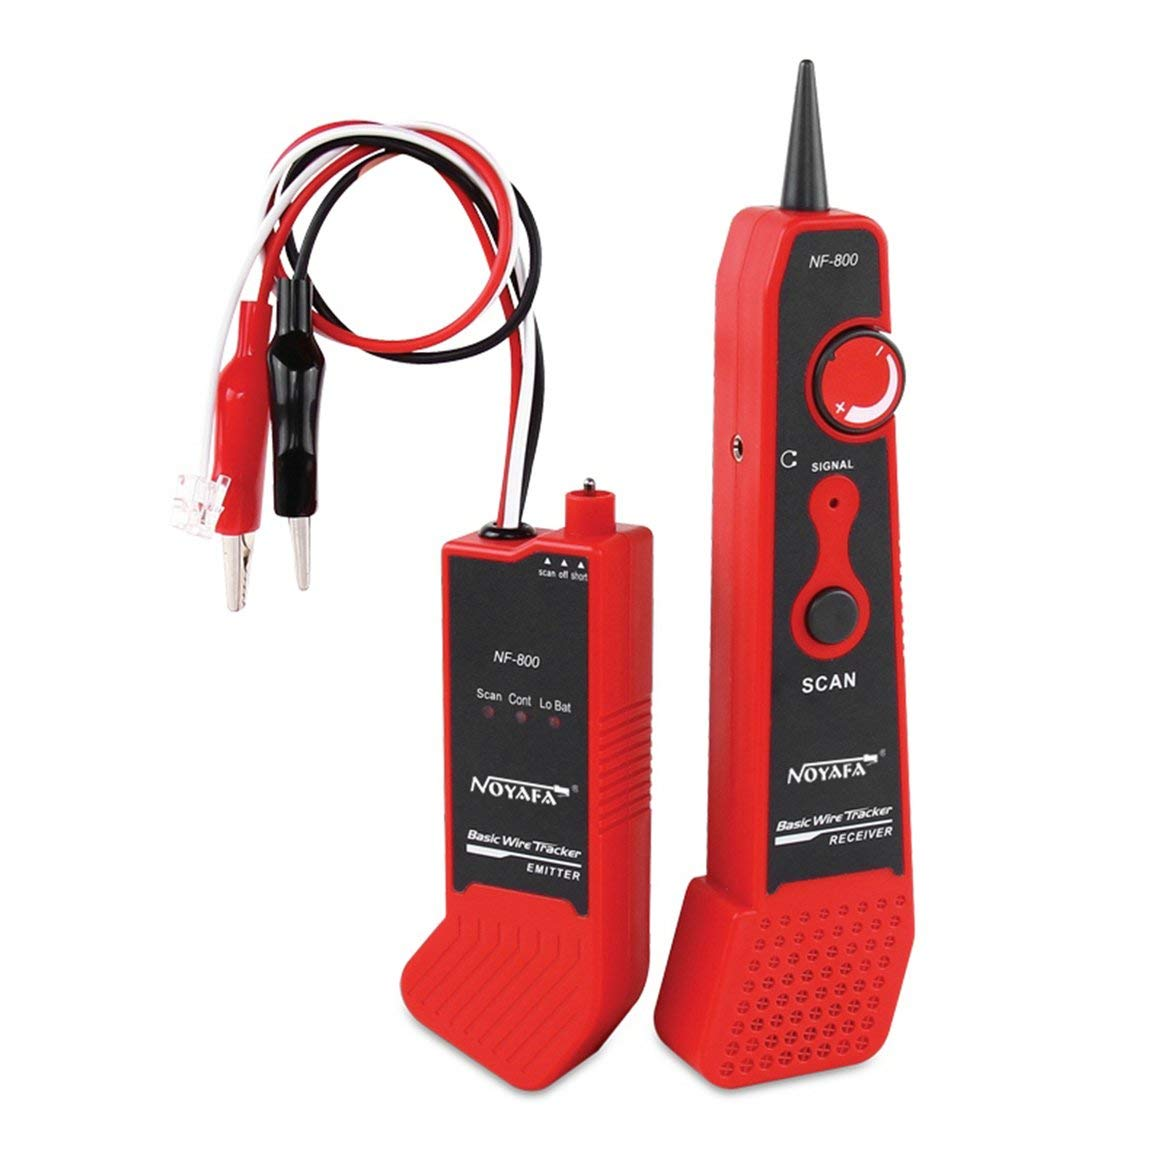 NF-800 RJ11 RJ45 Telecom Cable Dedicated Cable Tester Buscador de Cable de Red Probador de Cable de Metal Wire Tracker Kit de Herramienta de Diagnó stico Delicacydex